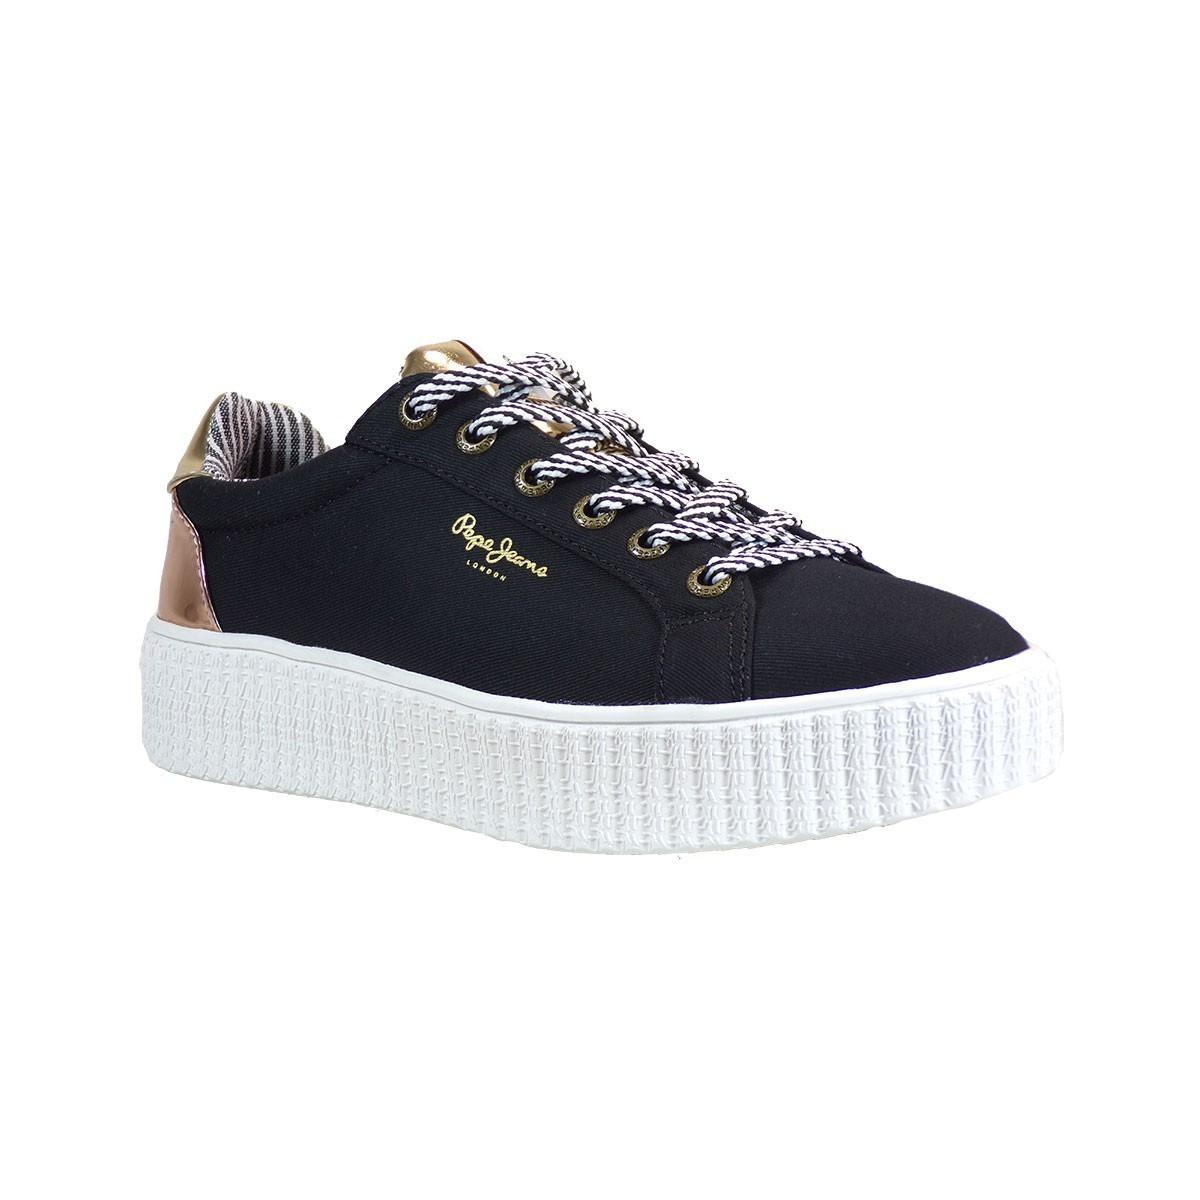 9a96d3cd6f8 Pepe jeans FRIDA Sneakers Γυναικεία Παπούτσια PLS30686-999 Μαύρο